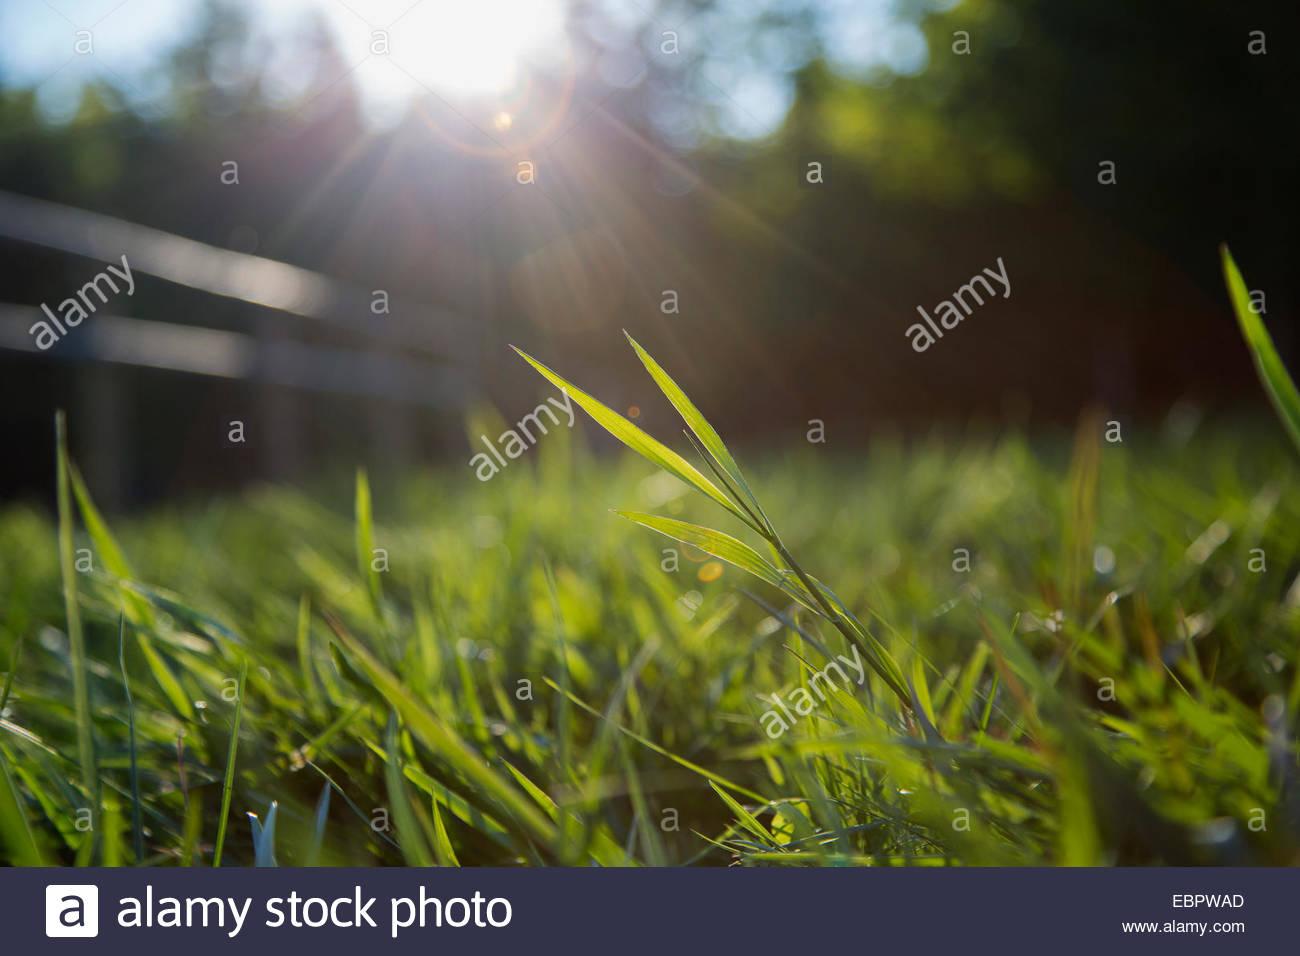 Sun shining on blades of grass - Stock Image